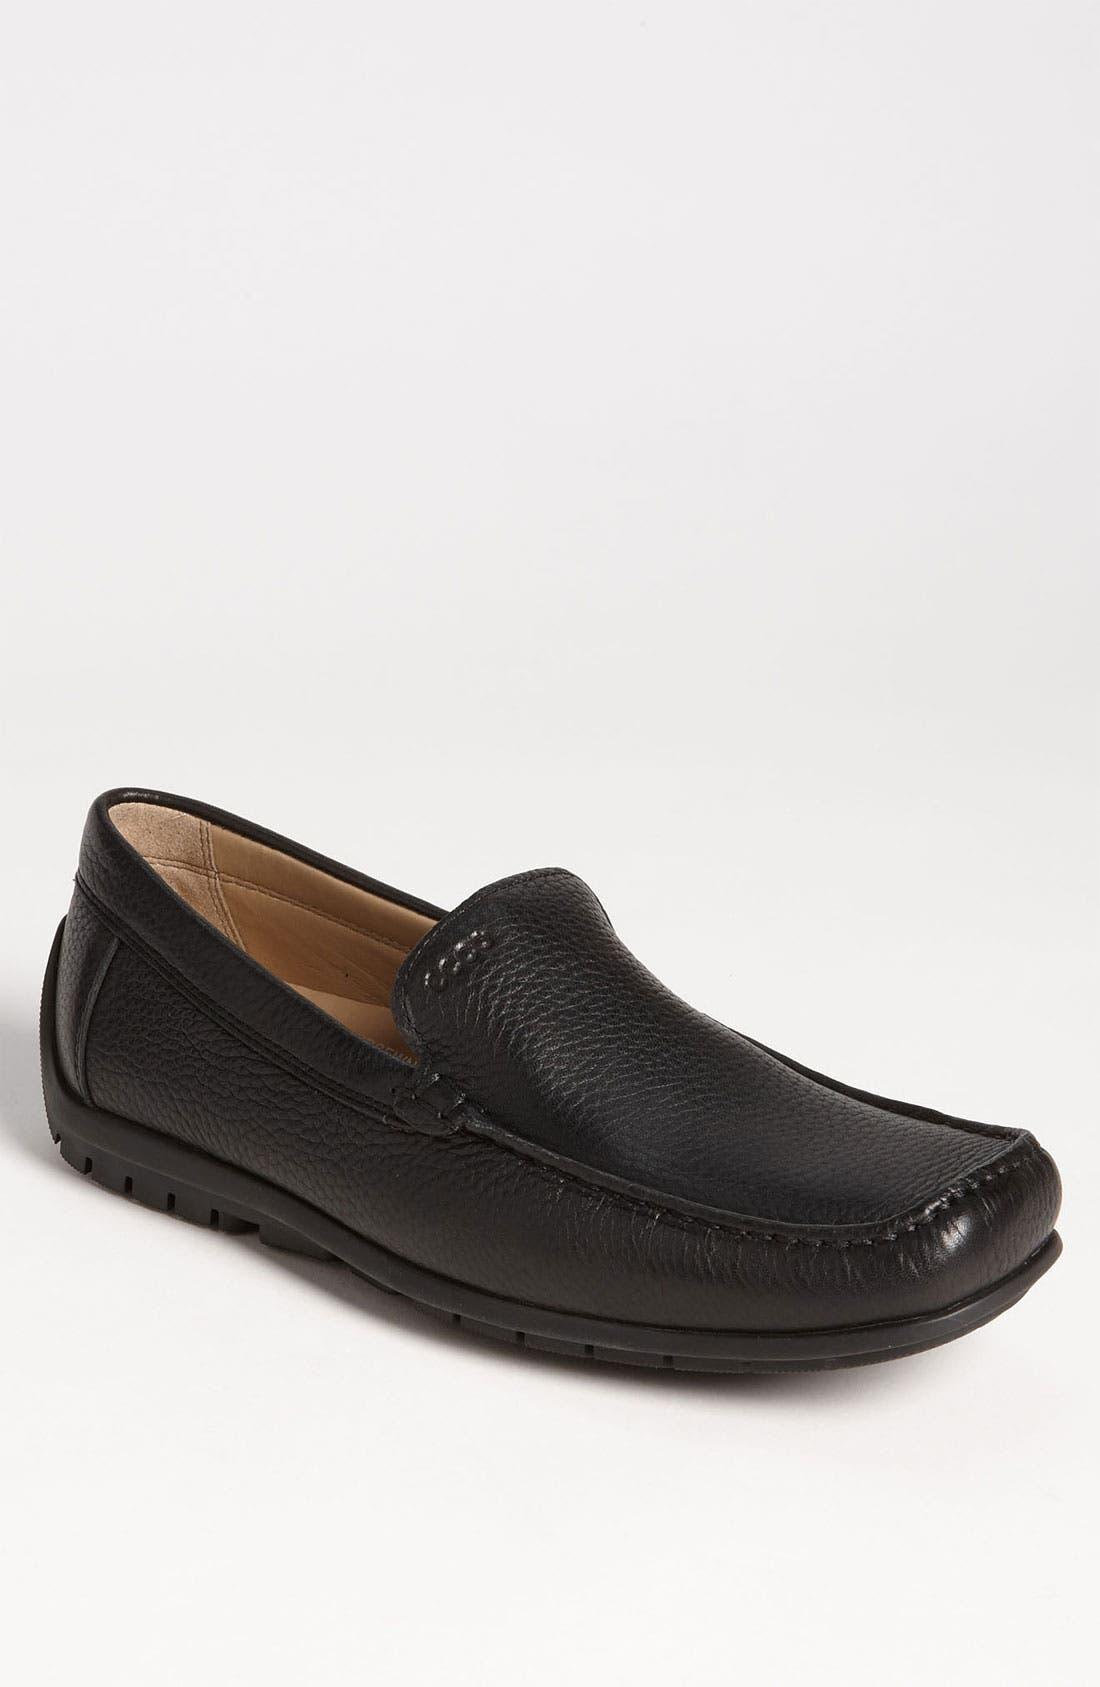 Main Image - ECCO 'Soft' Driving Shoe (Men)